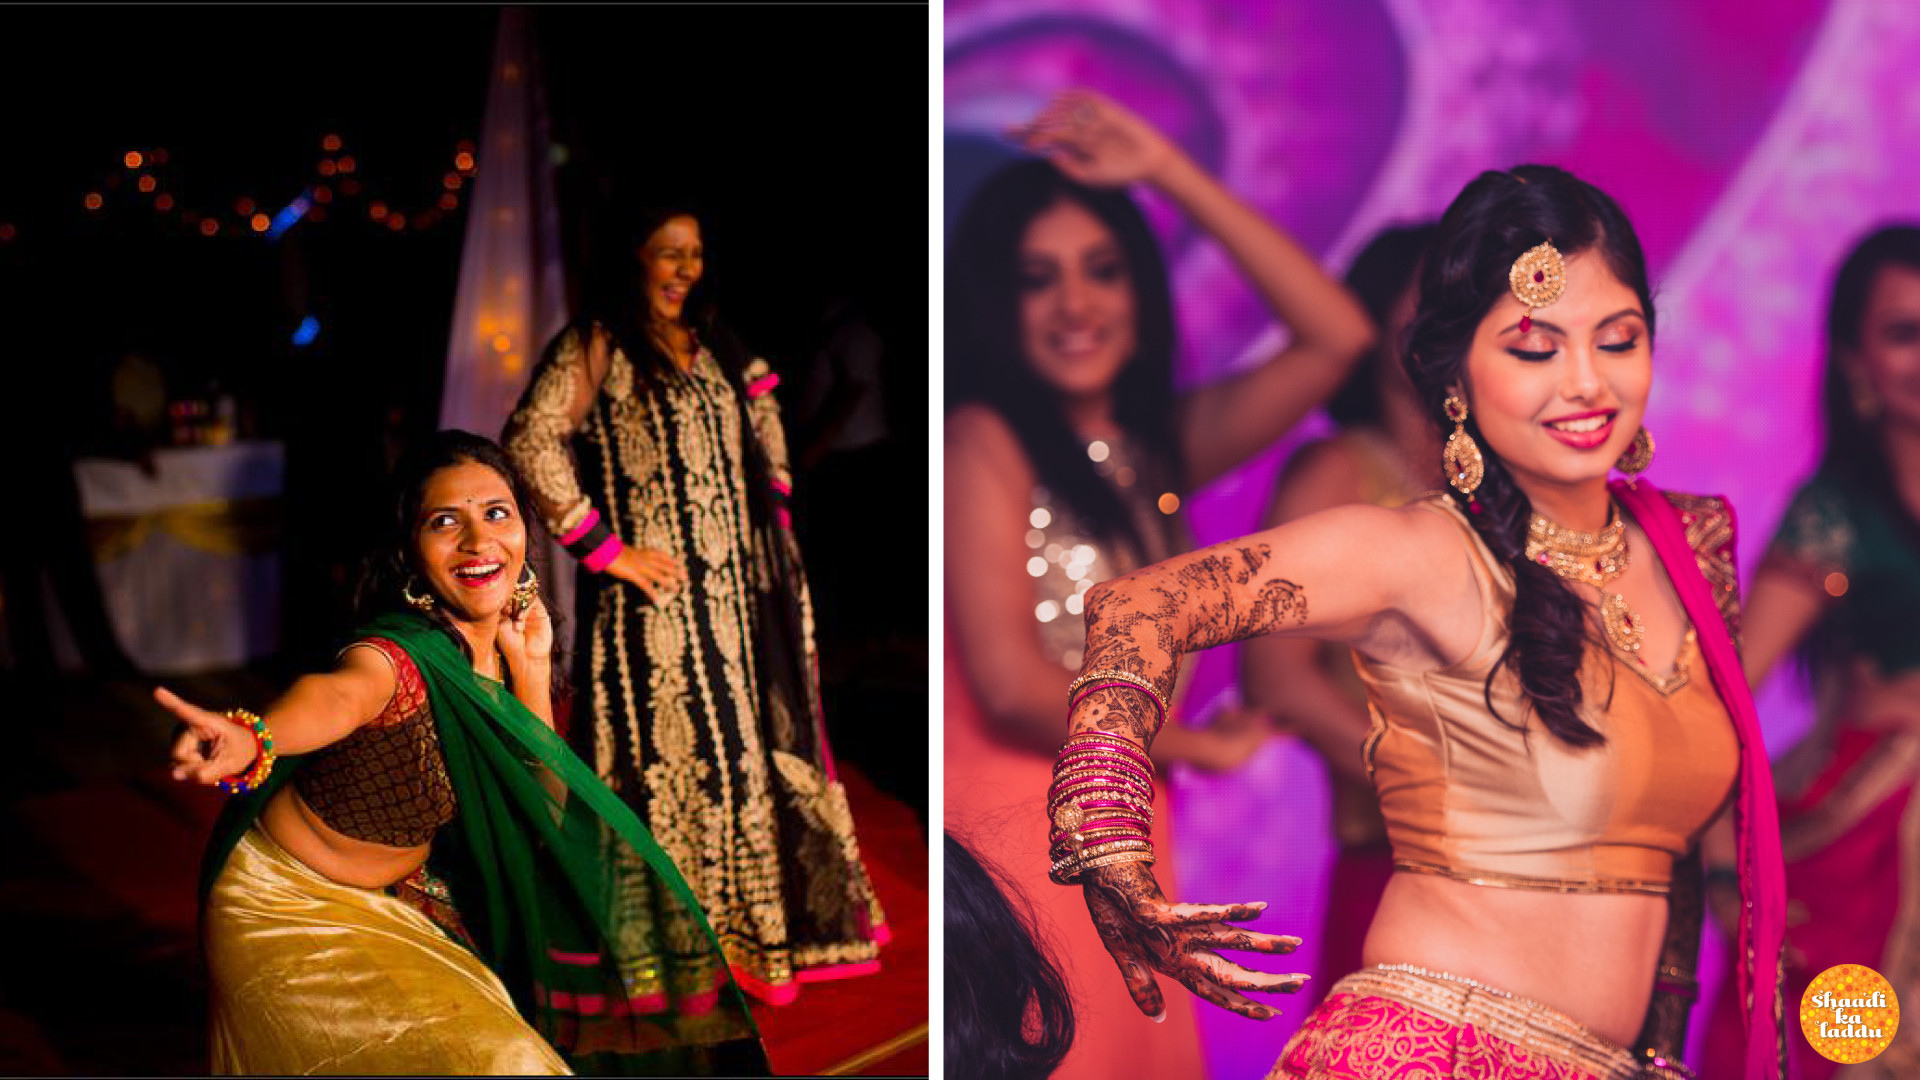 Swing N Dance Academy wedding choreographers, dance preparation for wedding sangeet ceremony